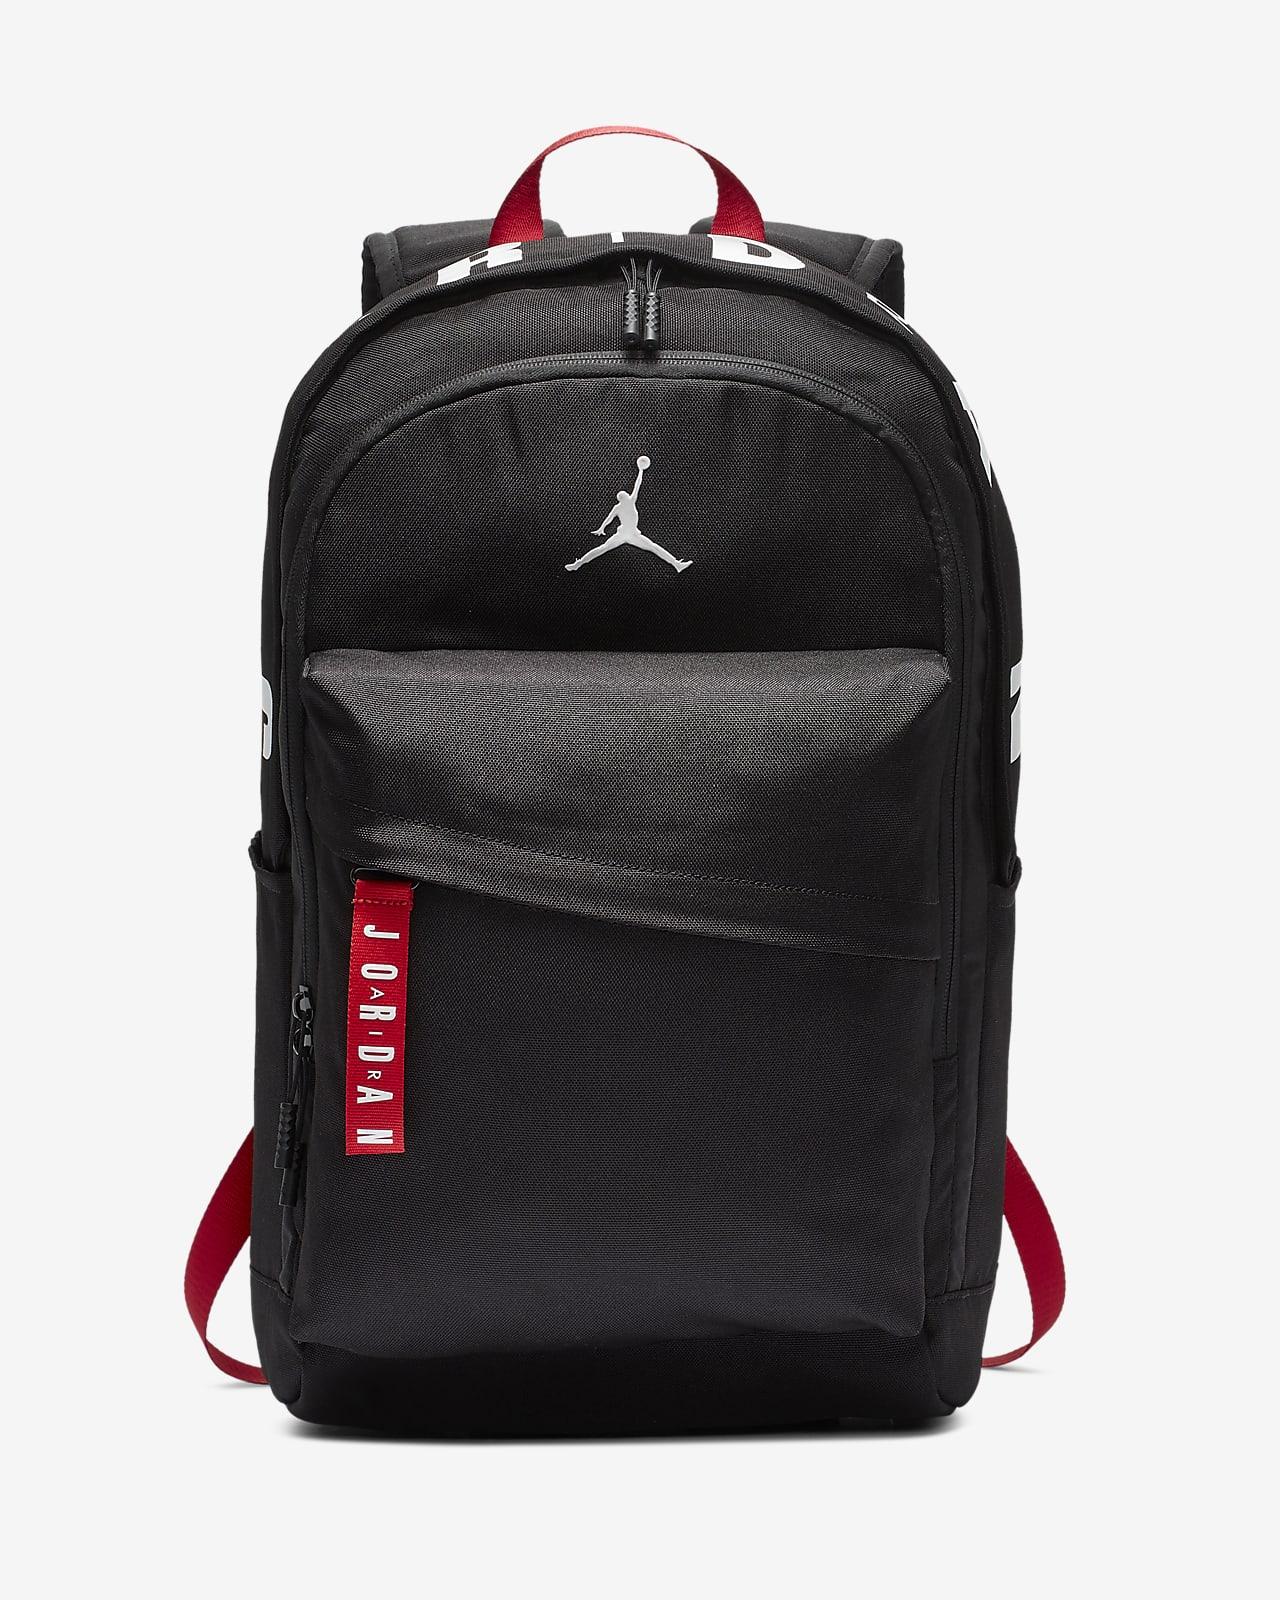 Jordan Backpack (Large)